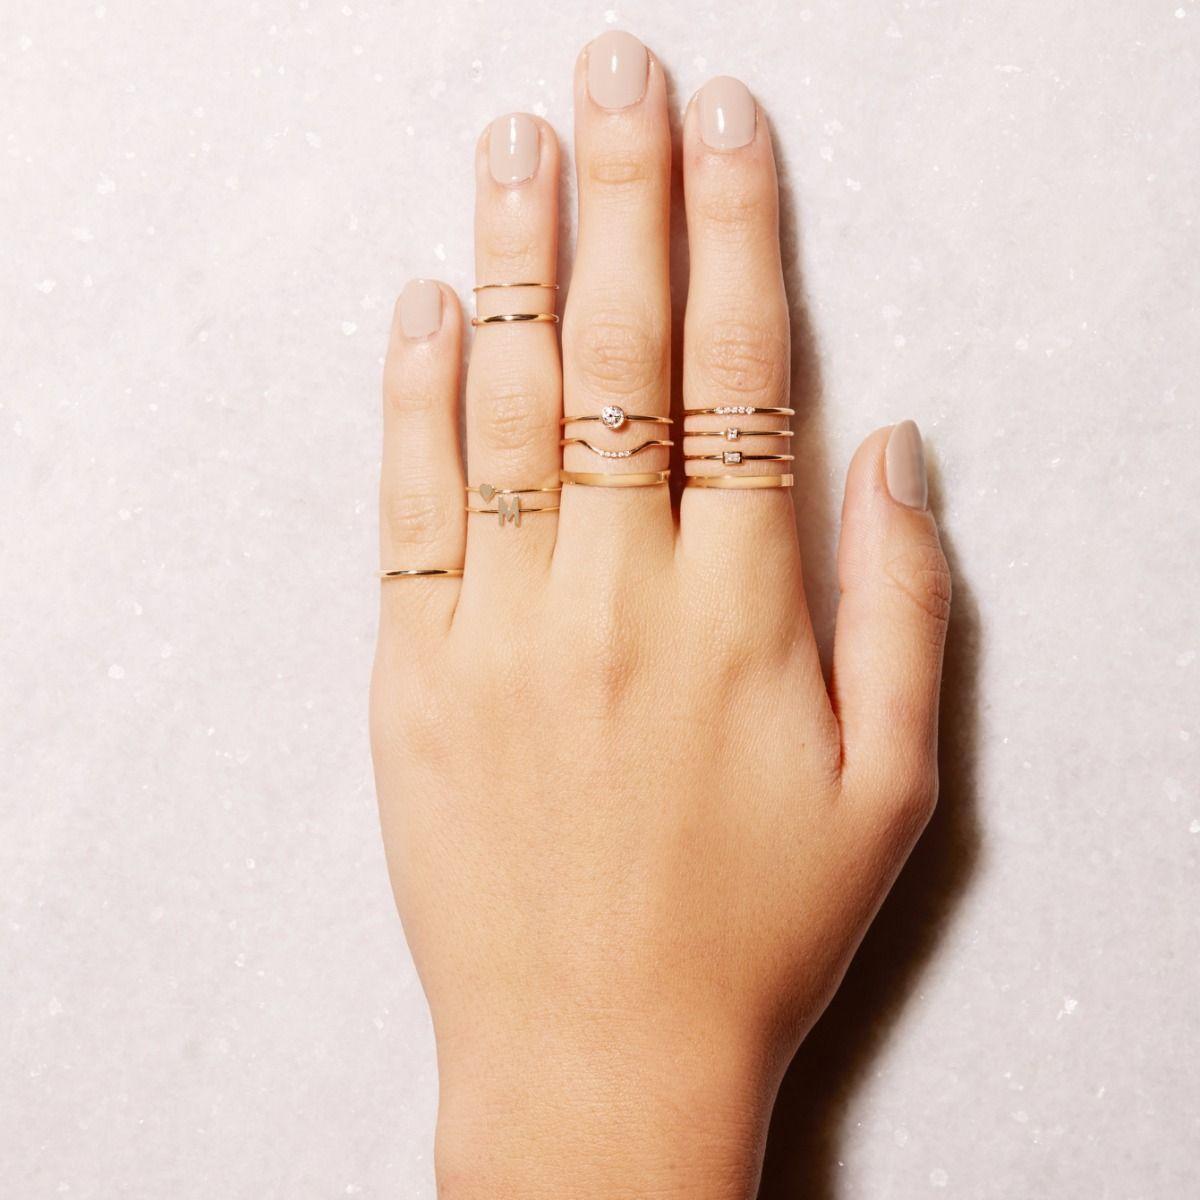 deeda6af040 Small Round Diamond Ring - STONE AND STRAND